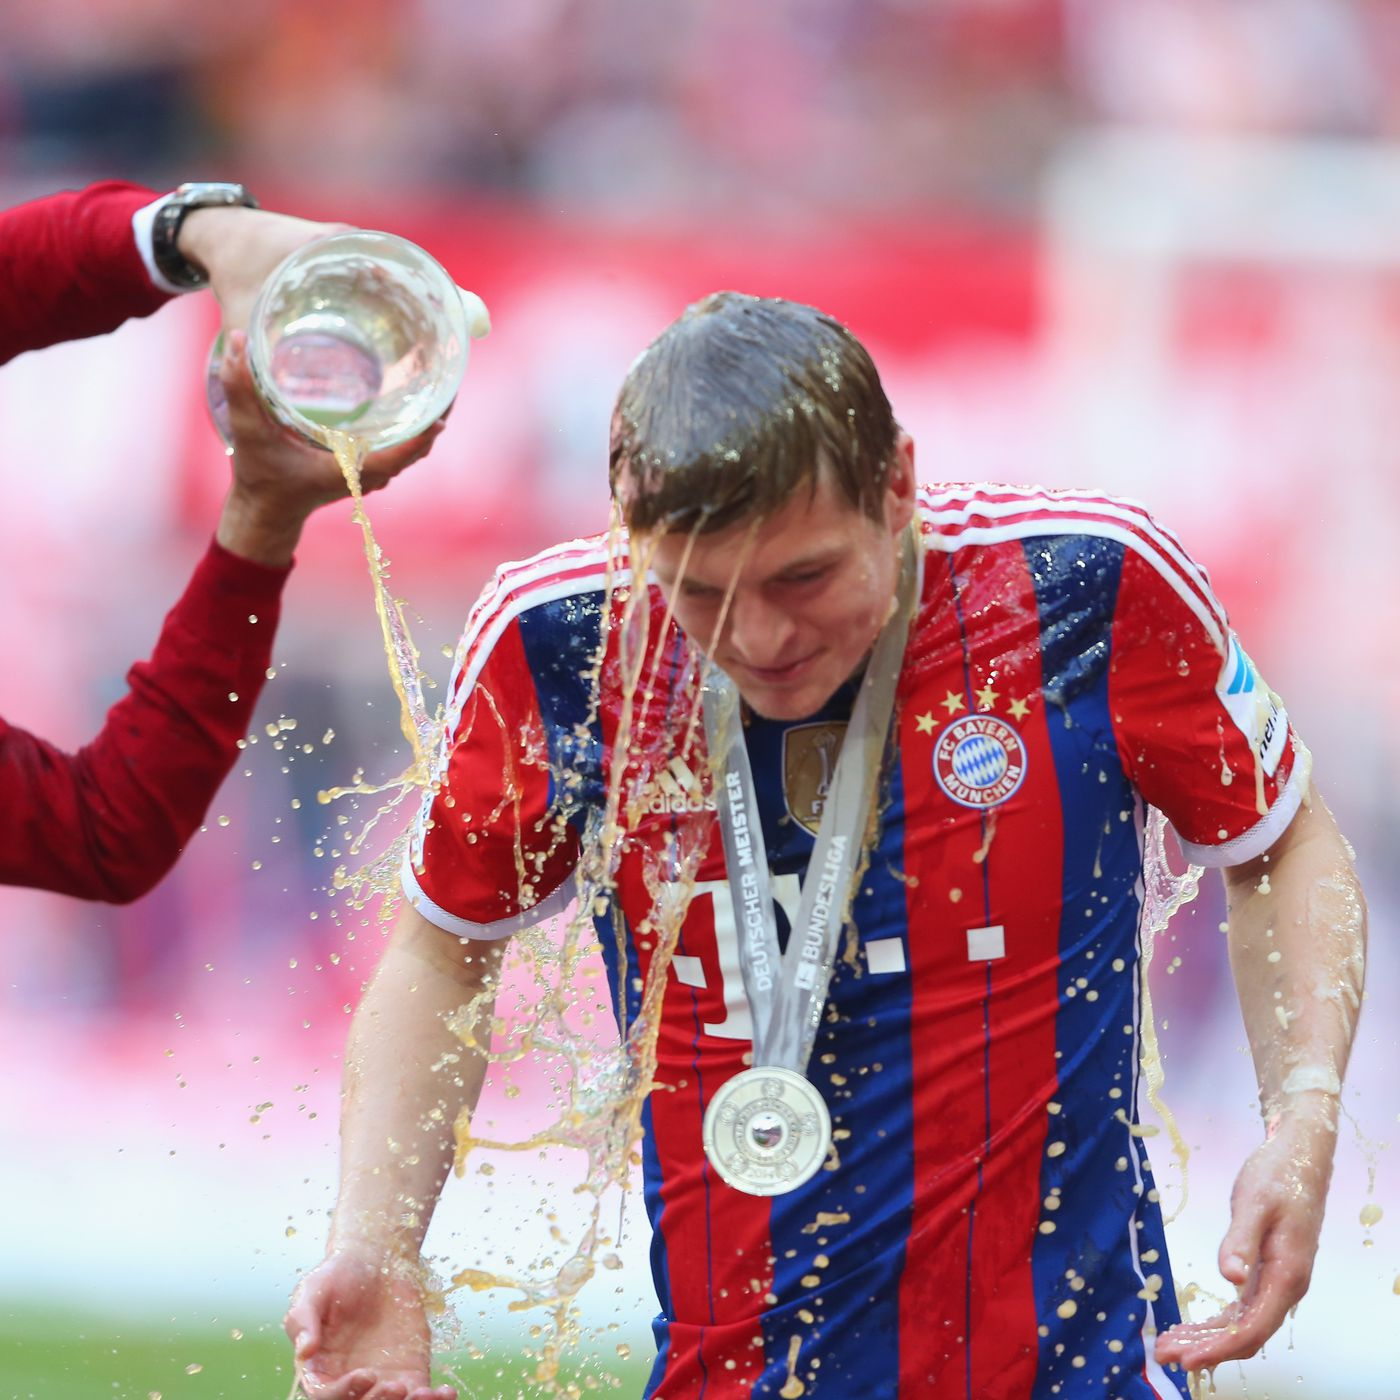 Toni Kroos praises his development under Pep Guardiola at Bayern Munich -  Bavarian Football Works